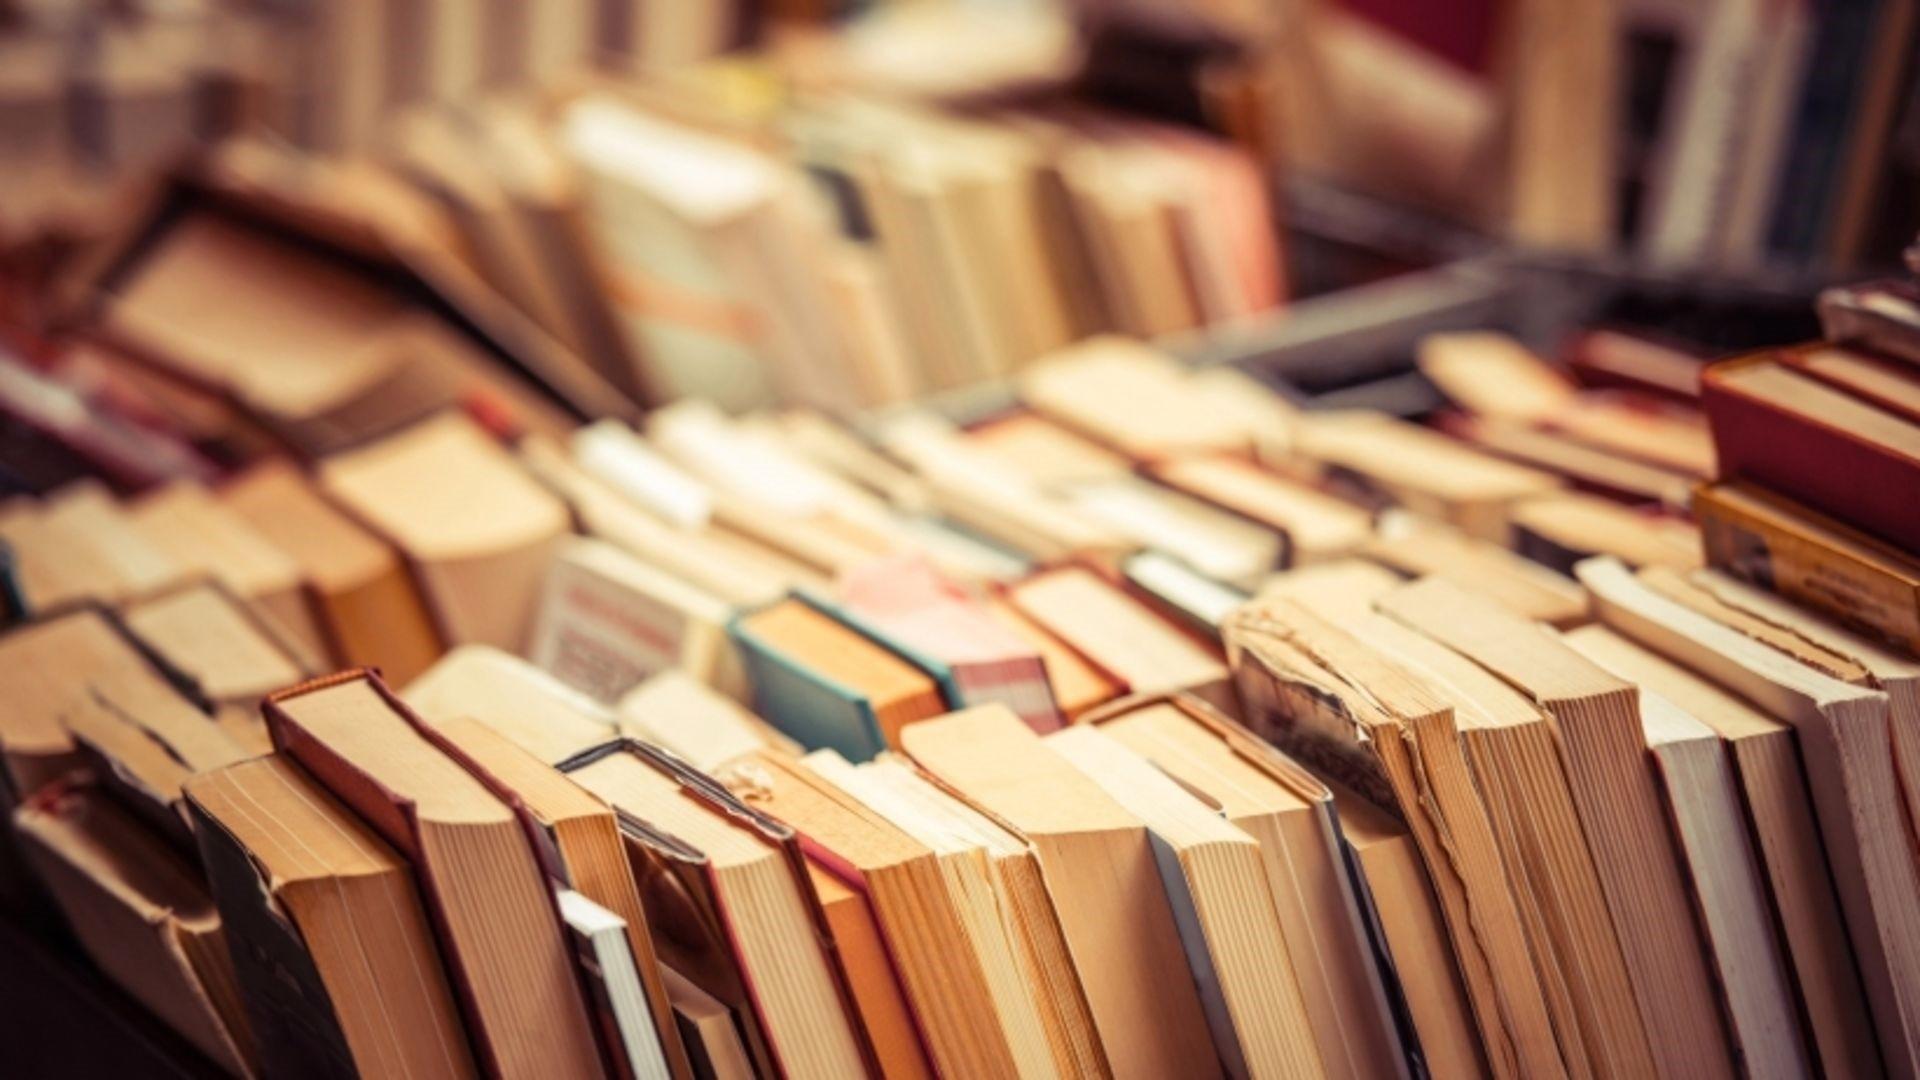 Books hd wallpaper download